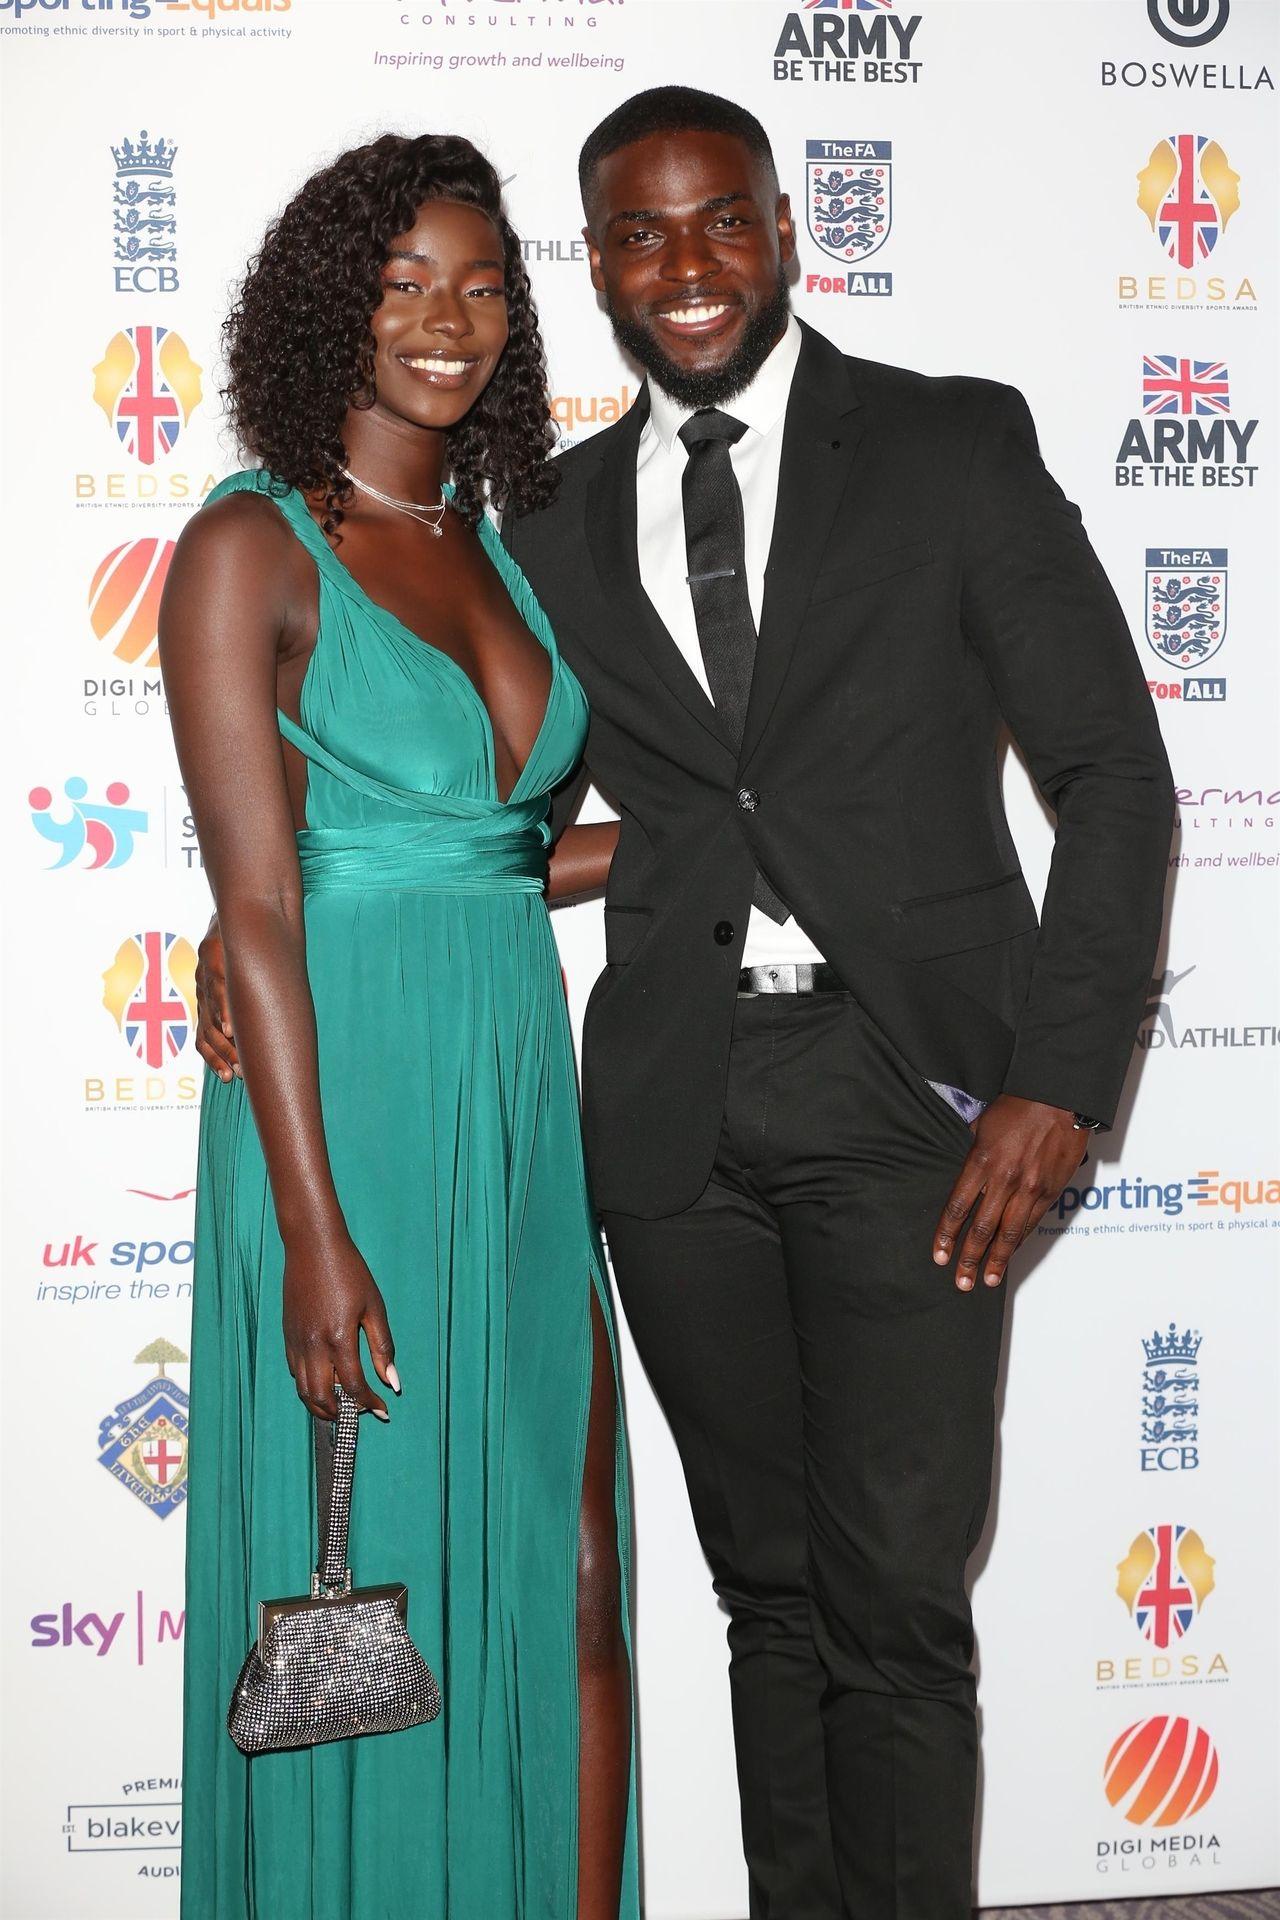 Mike Boateng & Priscilla Anyabu Are Seen At British Ethnic Diversity Sports Awards 0008